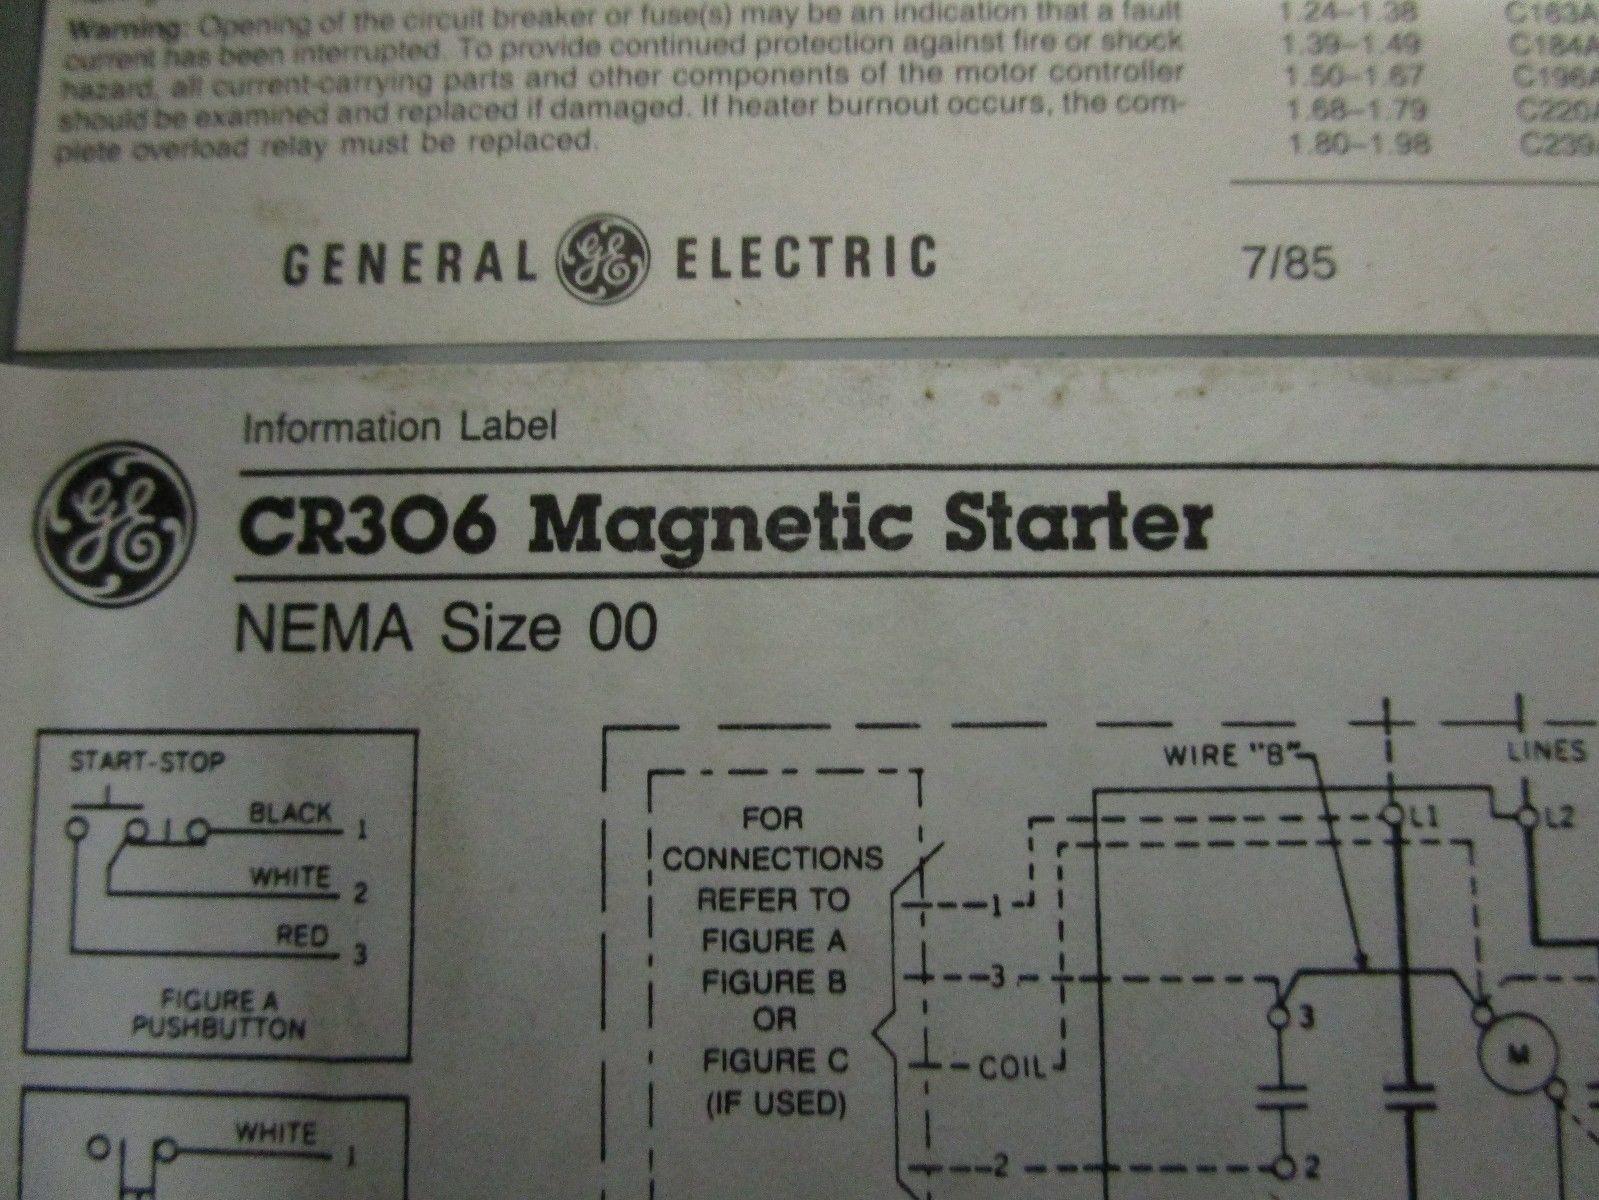 Comely Ge Motor Starter Wiring Diagram Tv Reparation Lg Fresh At - Ge Motor Wiring Diagram